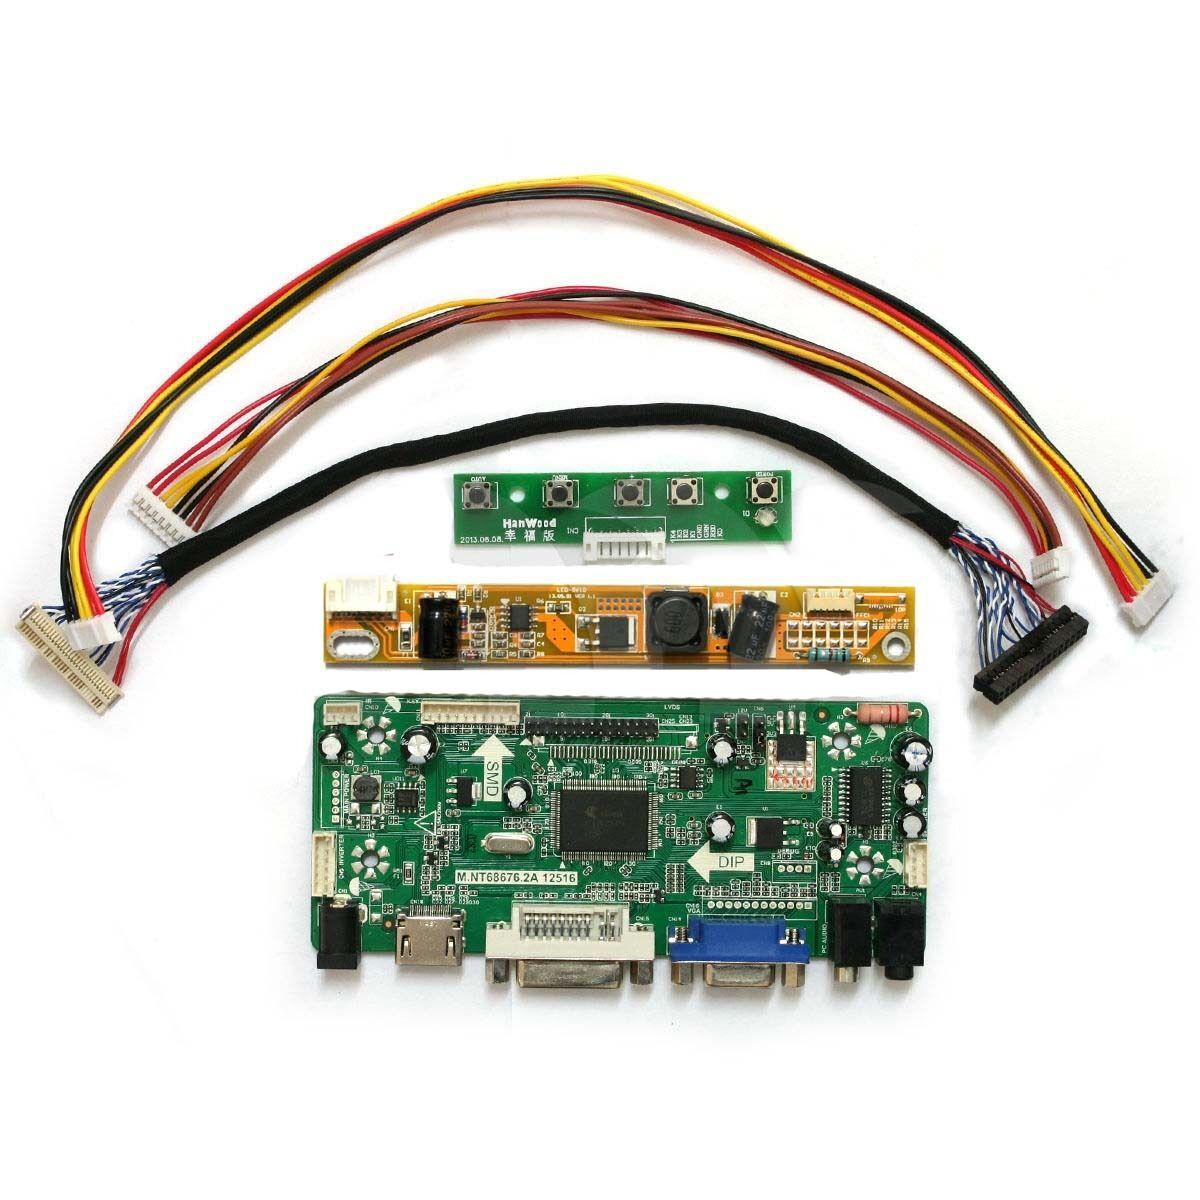 NT68676 LCD LVDS Controller Board Kit per HSD190ME12-A06 1280X1024 HDMI + DVI + VGA